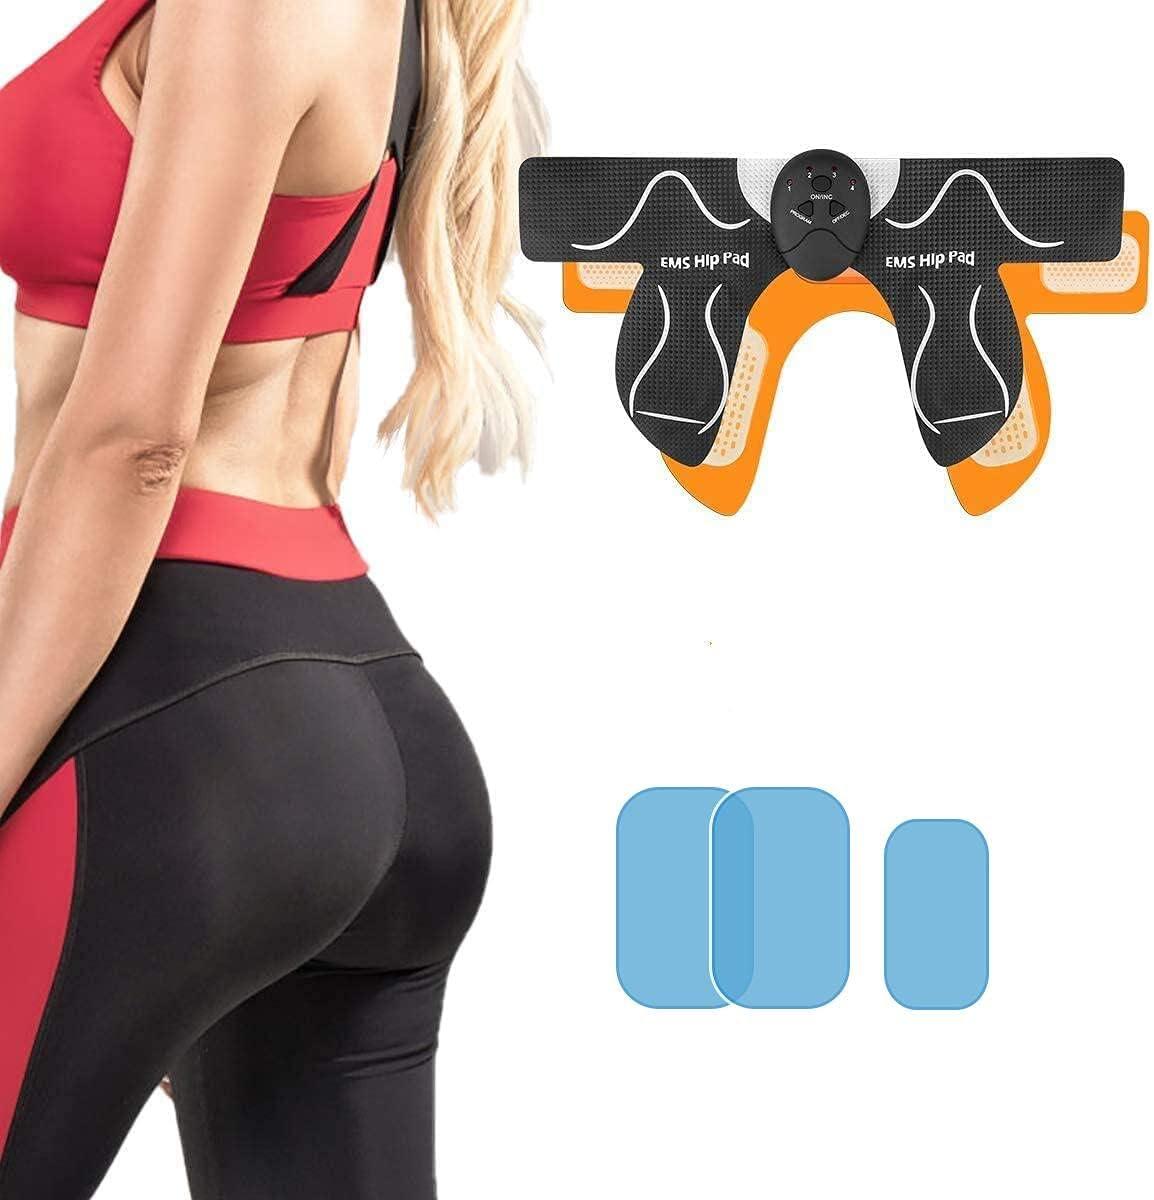 Abs Stimulator Machine Hips Trainer Thigh Toner Butt Lift Workout Equipment